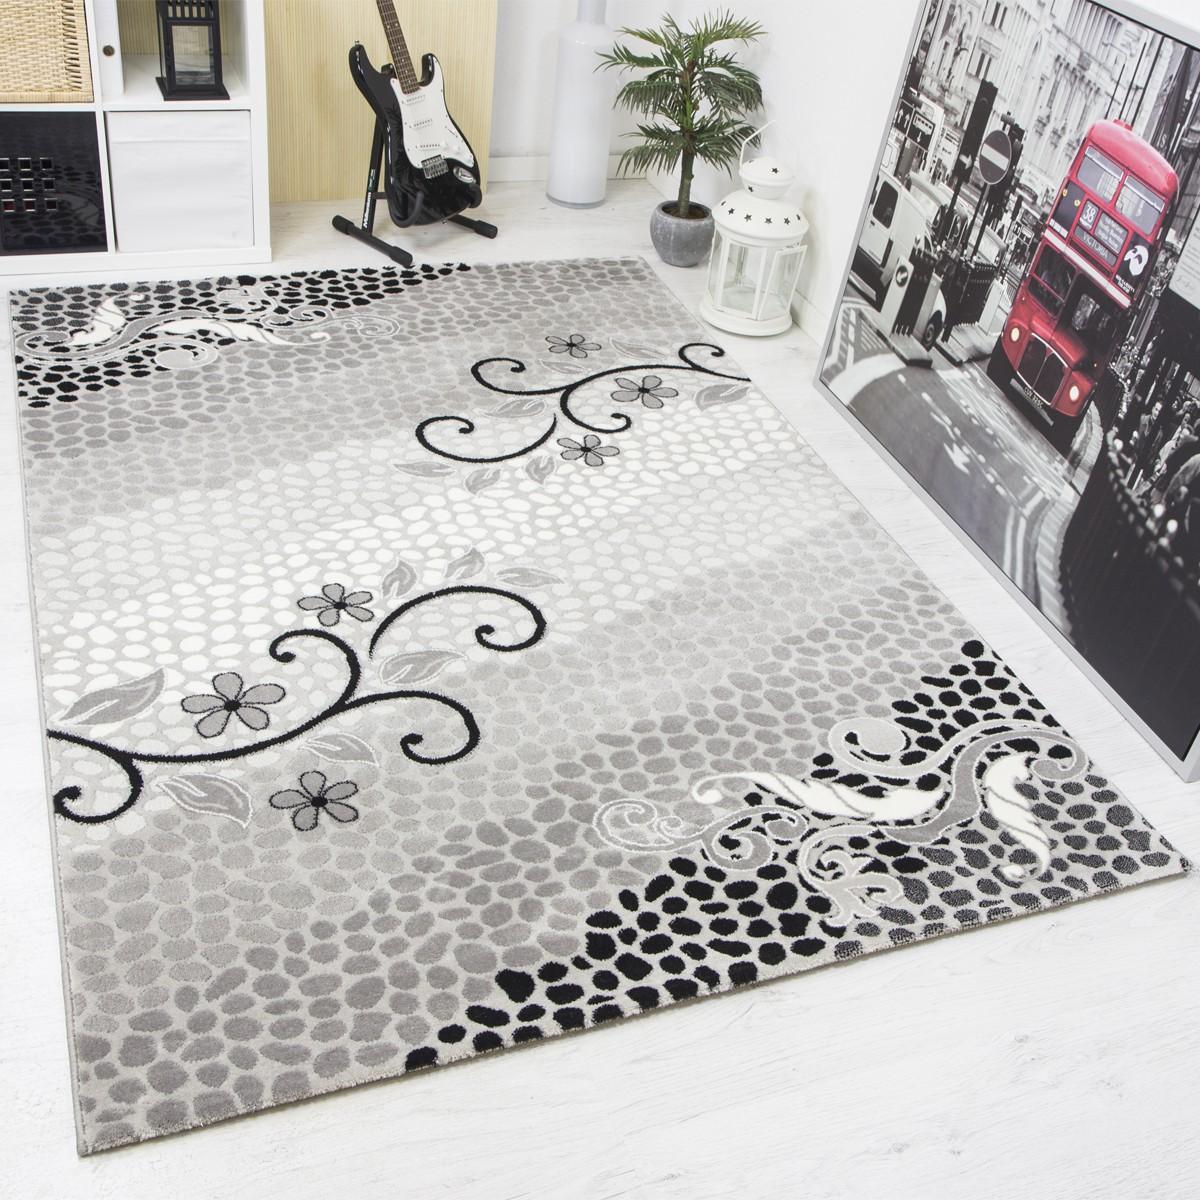 moderner teppich elegant optik mit glitzereffekt edel in. Black Bedroom Furniture Sets. Home Design Ideas